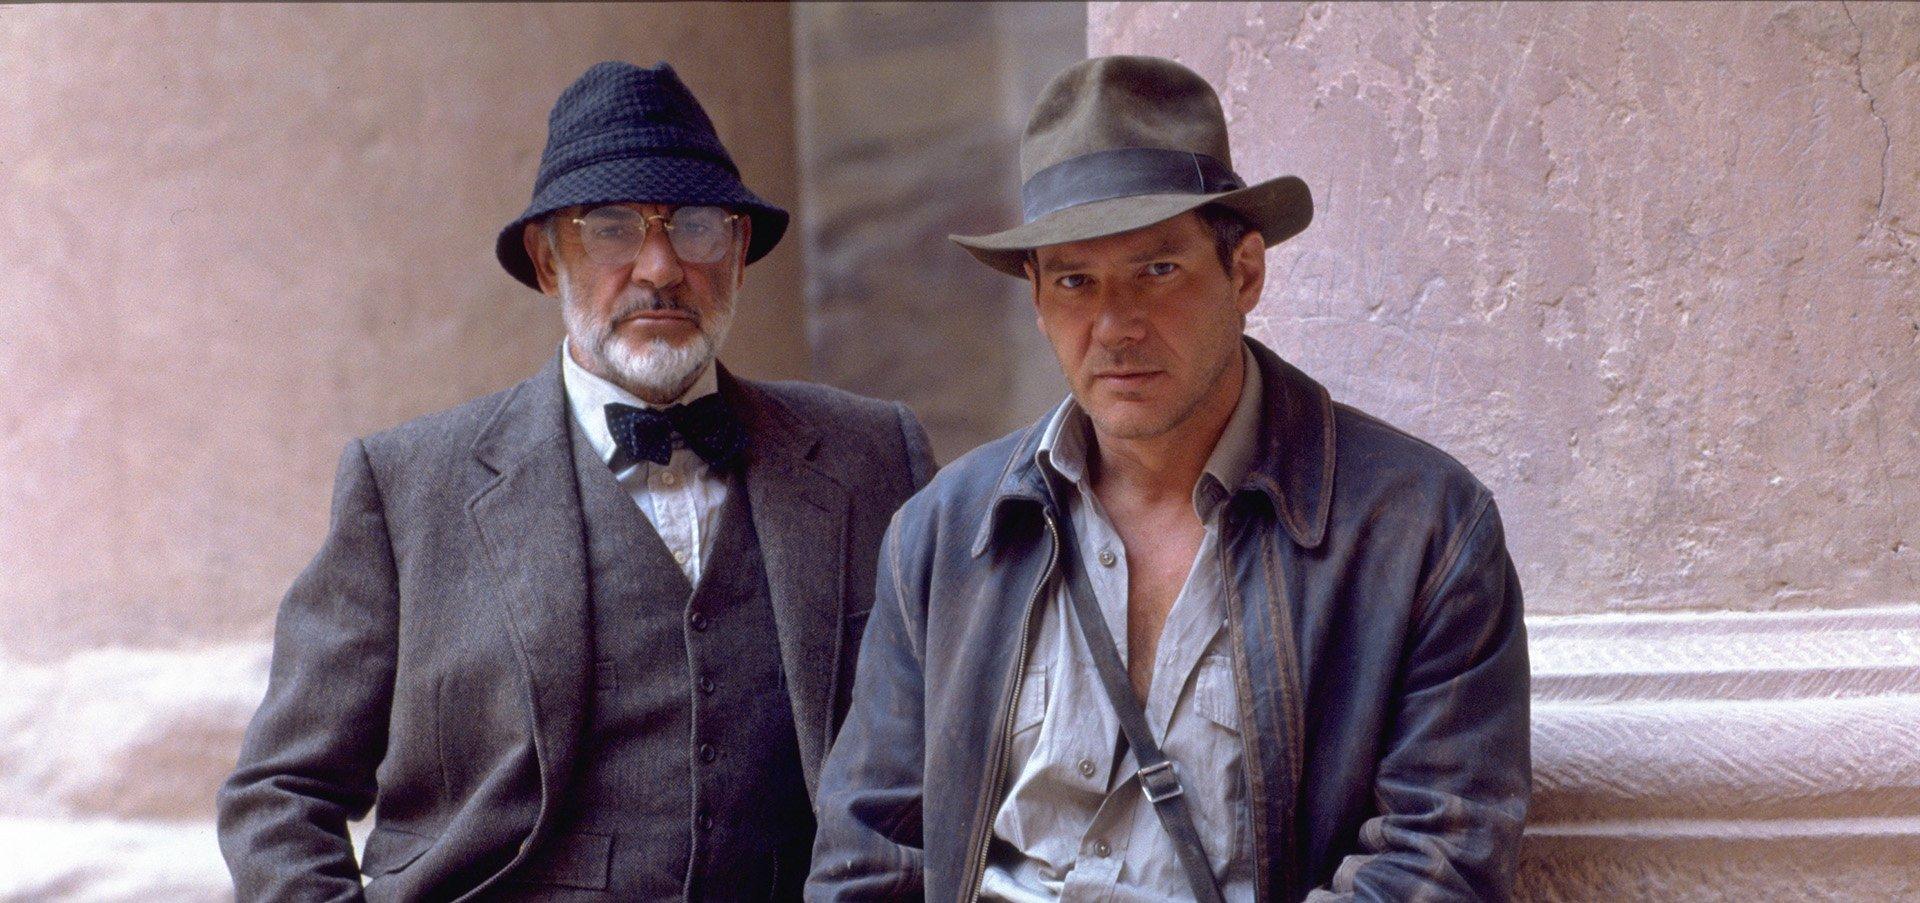 1989: Indiana Jones and the Last Crusade (8.2/10; 1 Oscar)